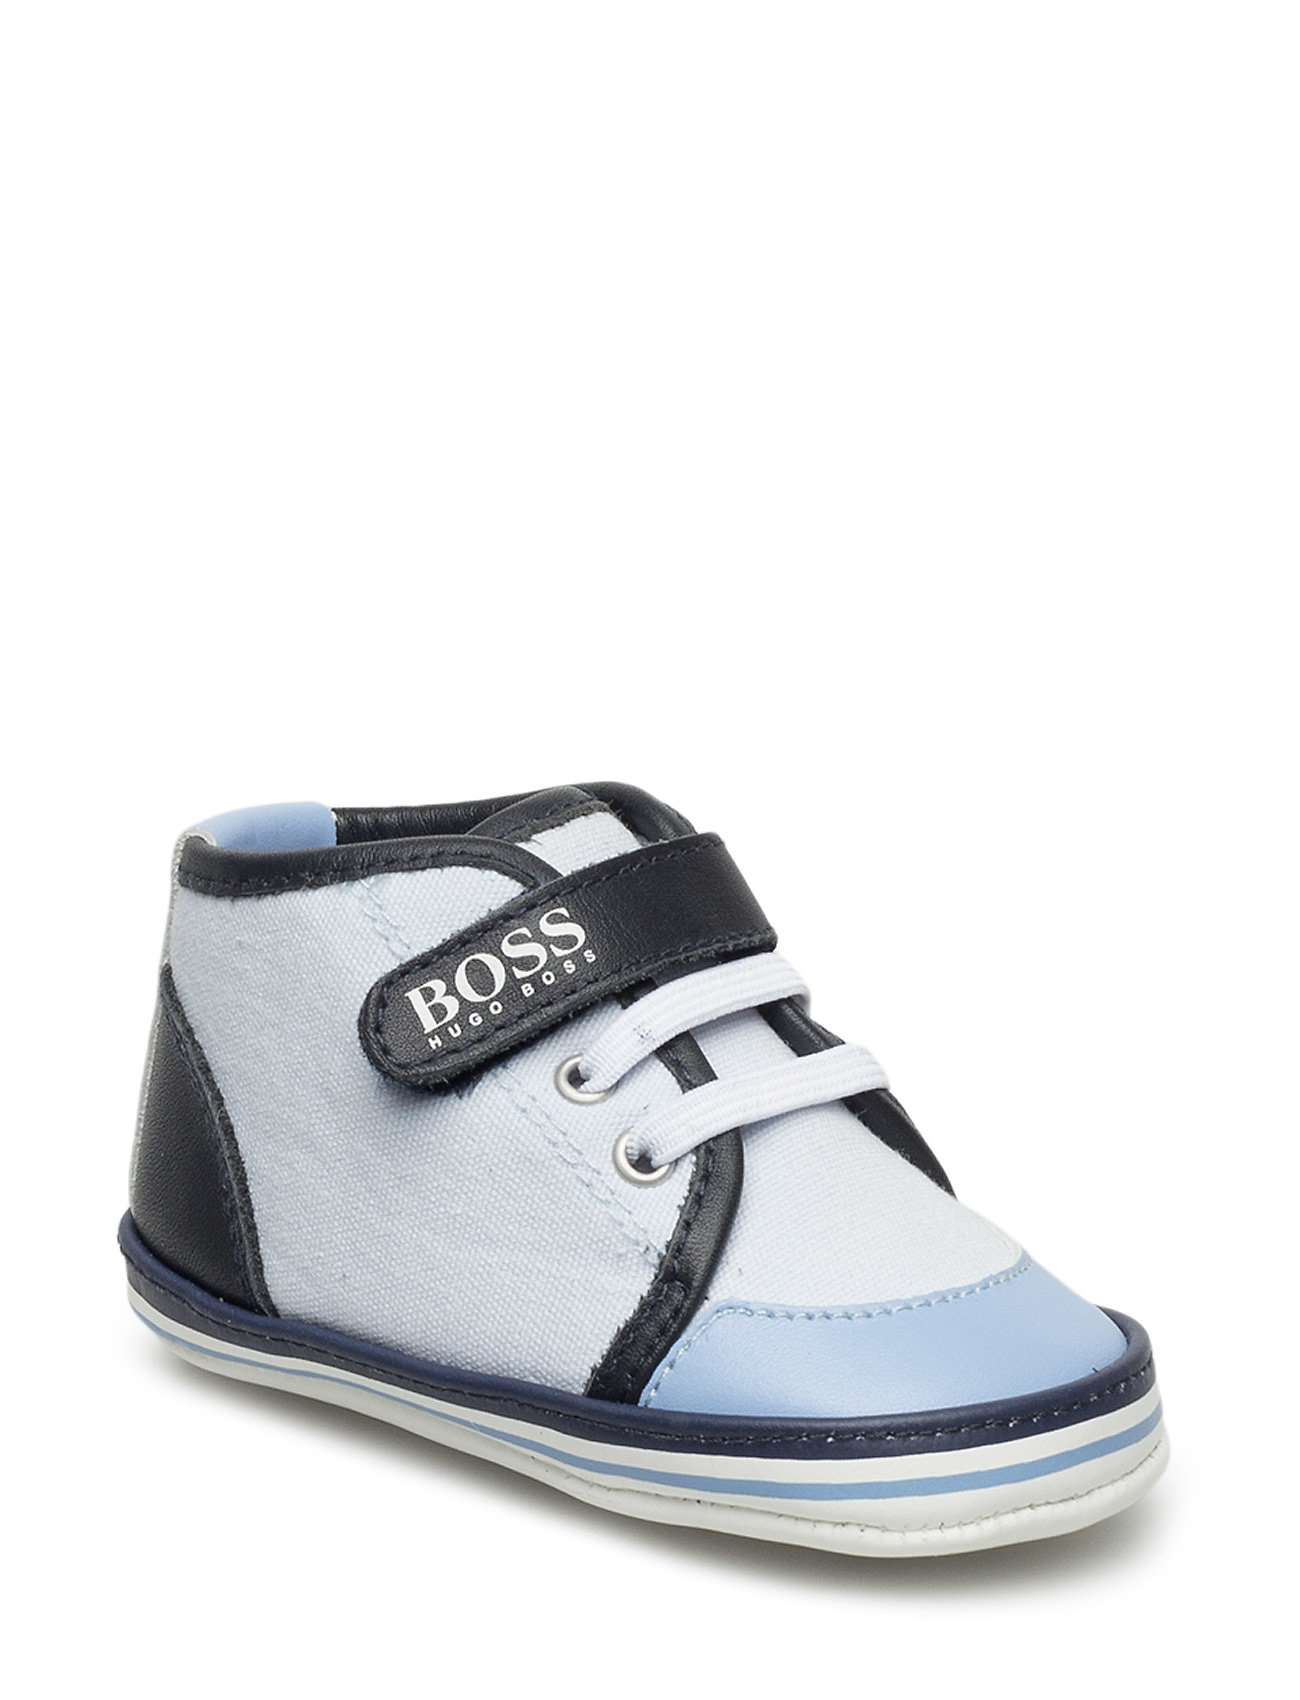 Trainers BOSS Sko & Sneakers til Børn i argil